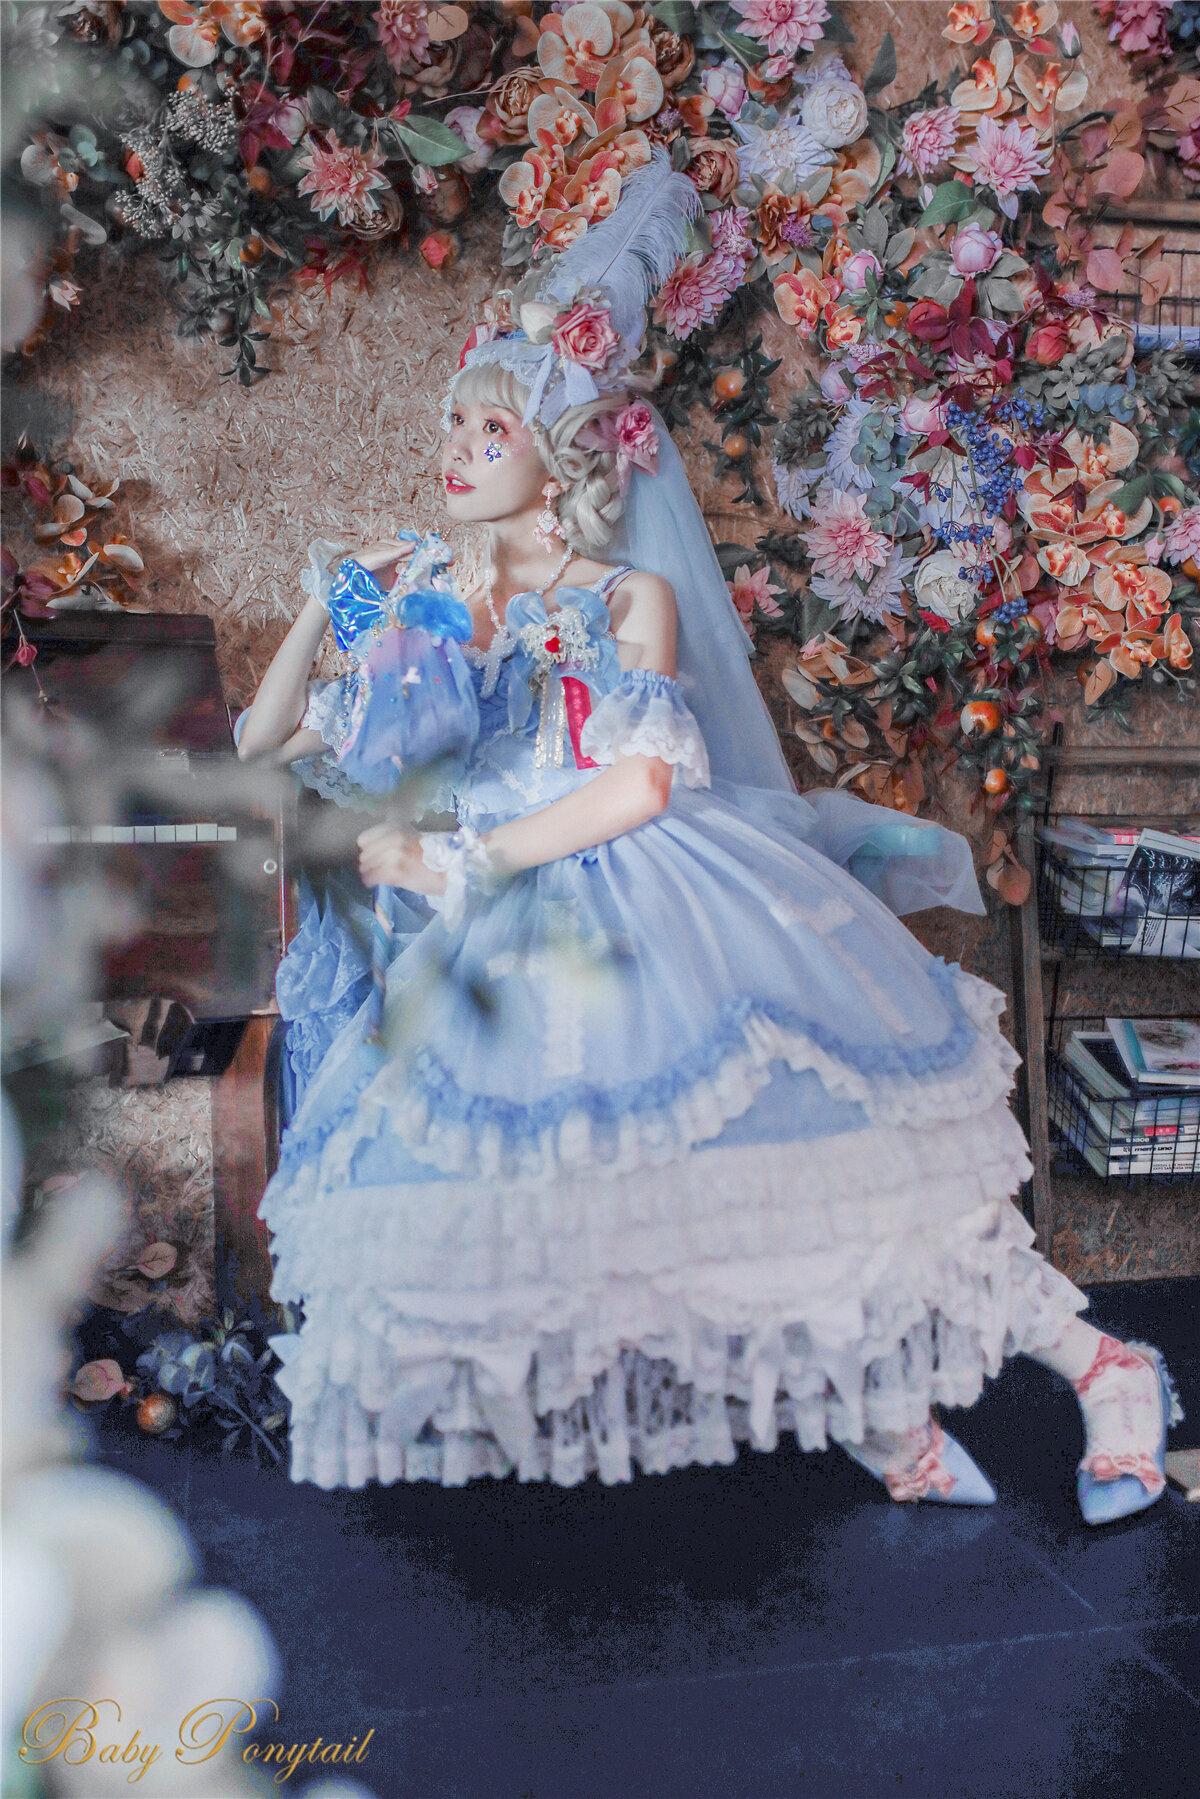 Babyponytail_Heavenly Teardrops_Model photo_JSK SAX_KAKA_14.jpg